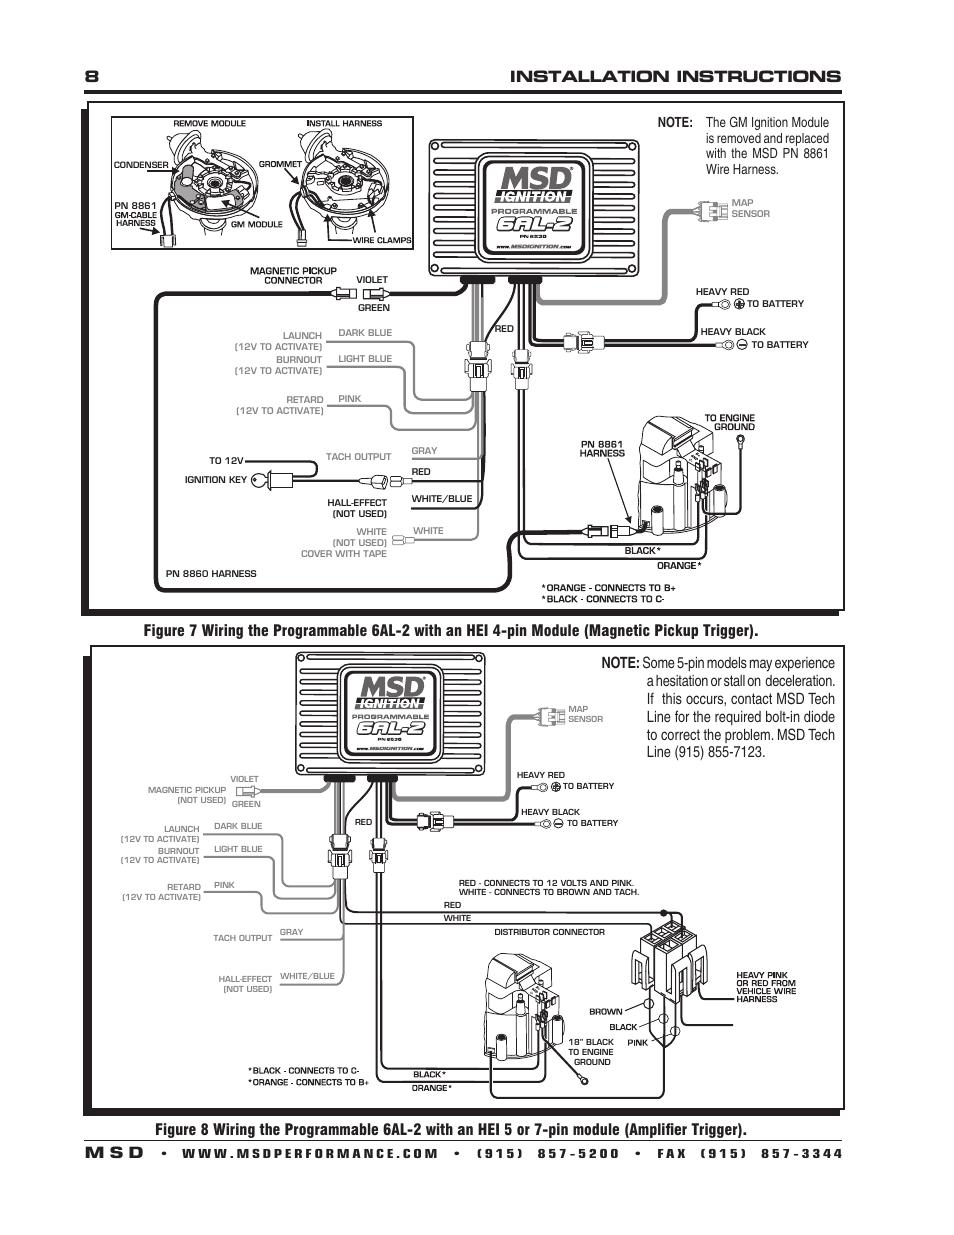 8installation instructions m s d msd 6530 digital programmable 6al 2 installation user manual page 8 20